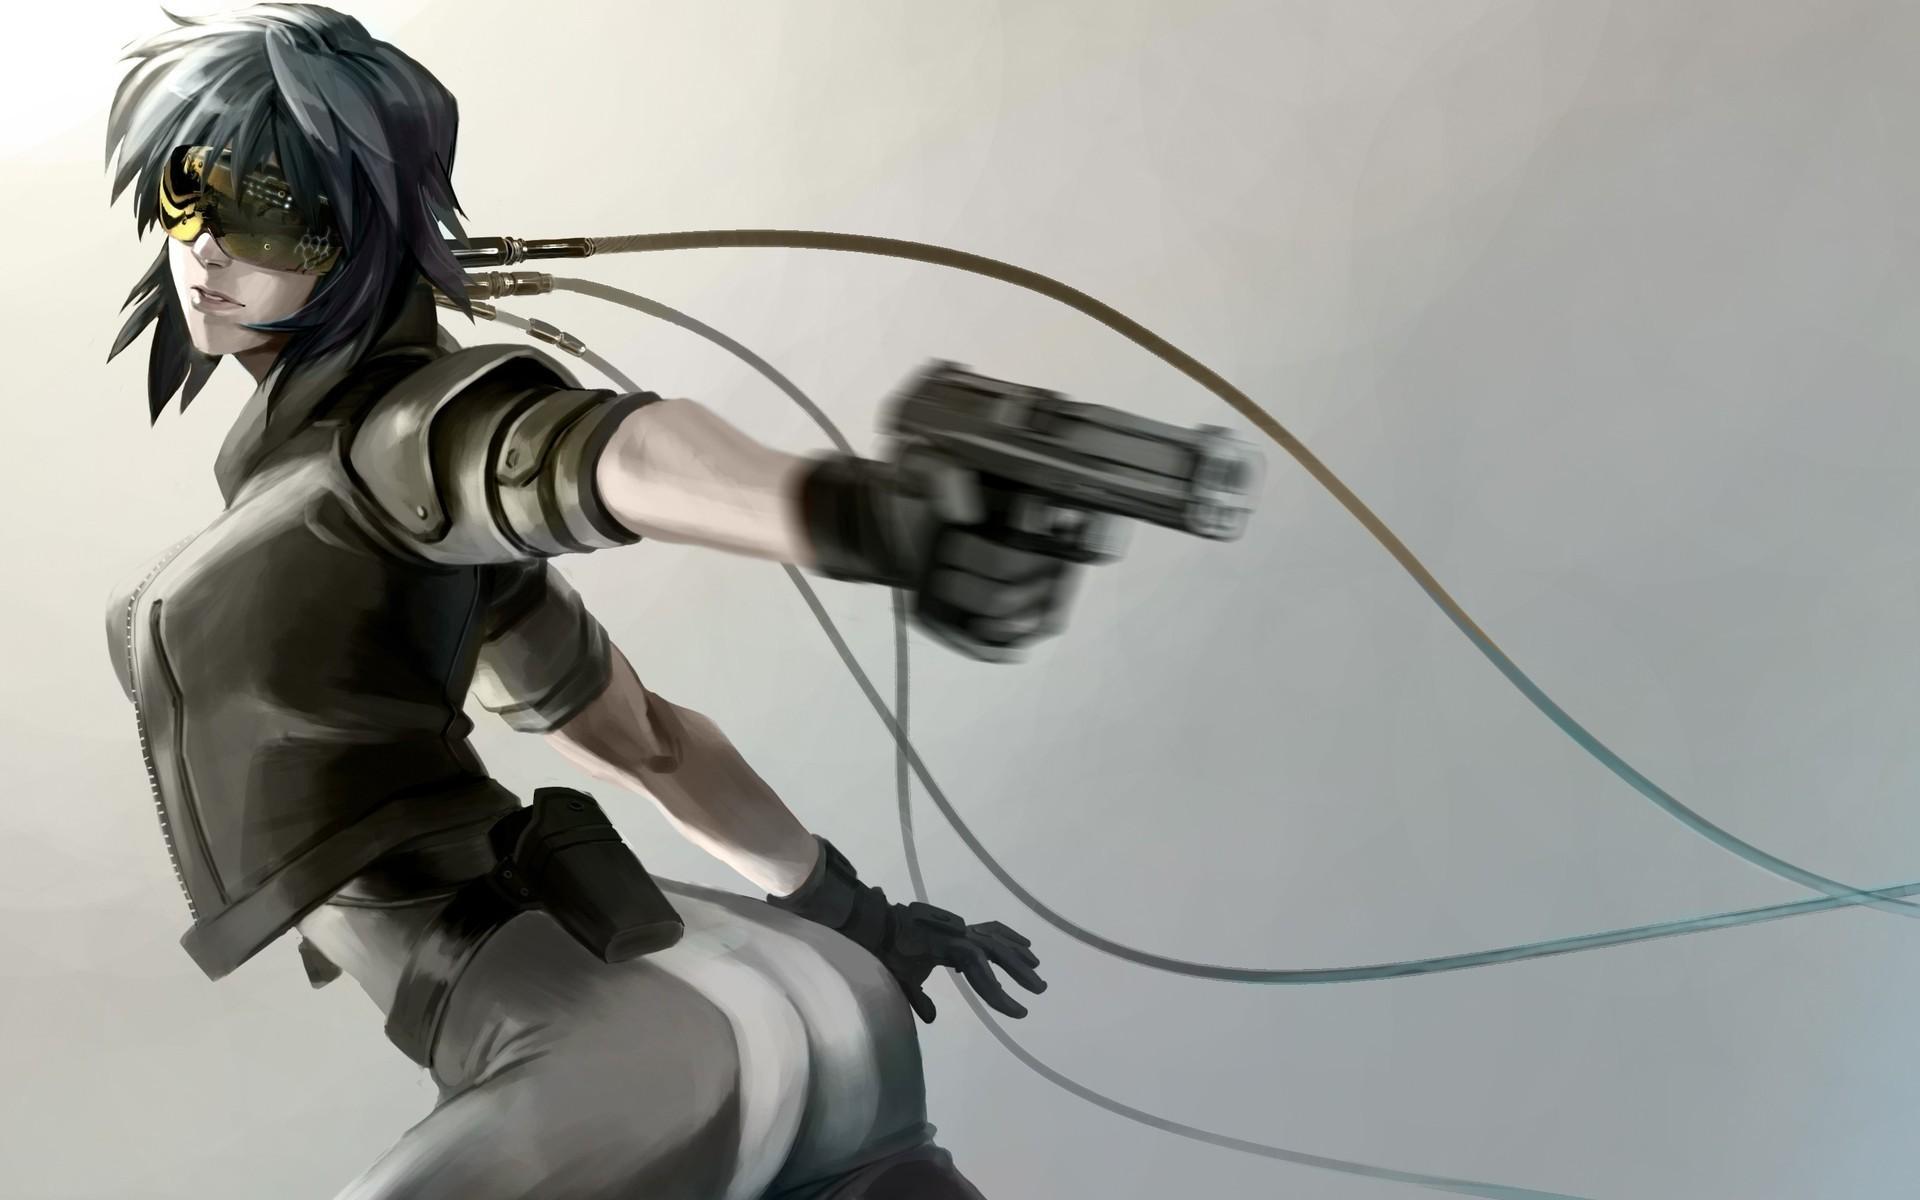 Anime 1920x1200 artwork anime Ghost in the Shell Kusanagi Motoko gun wires machine gun